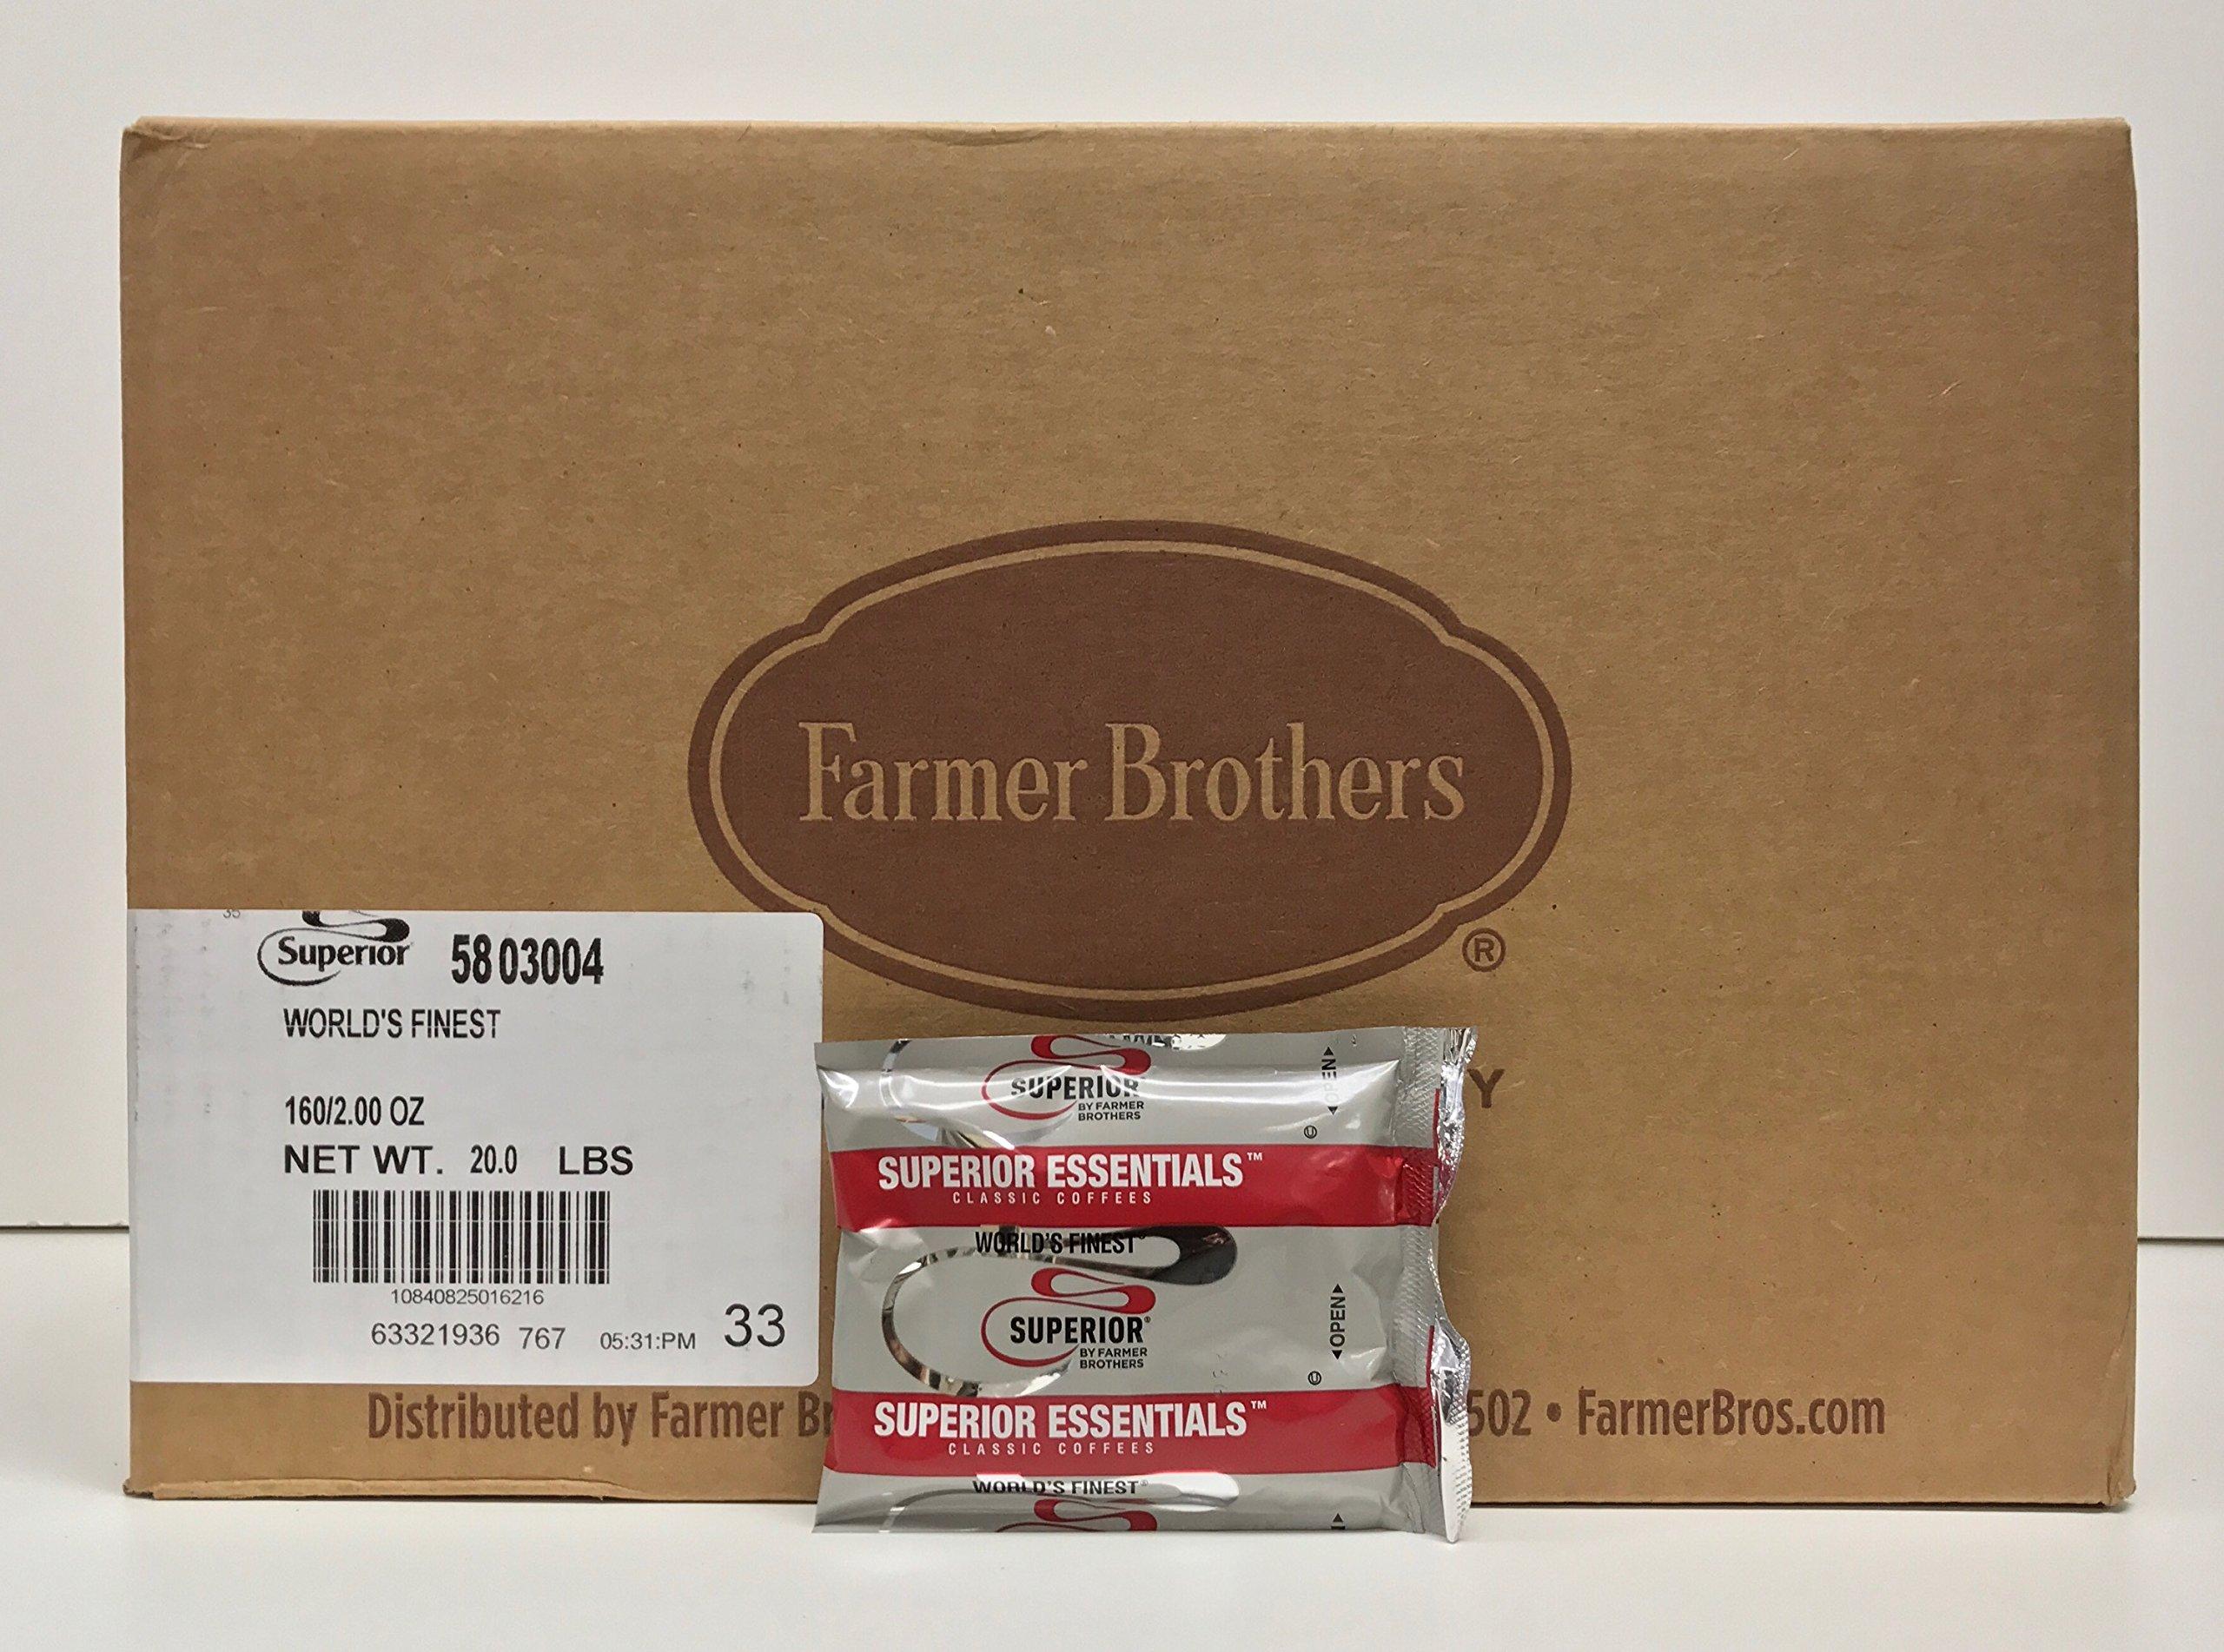 Superior World's Finest Ground Coffee (160 bags/2 oz) - 5803004